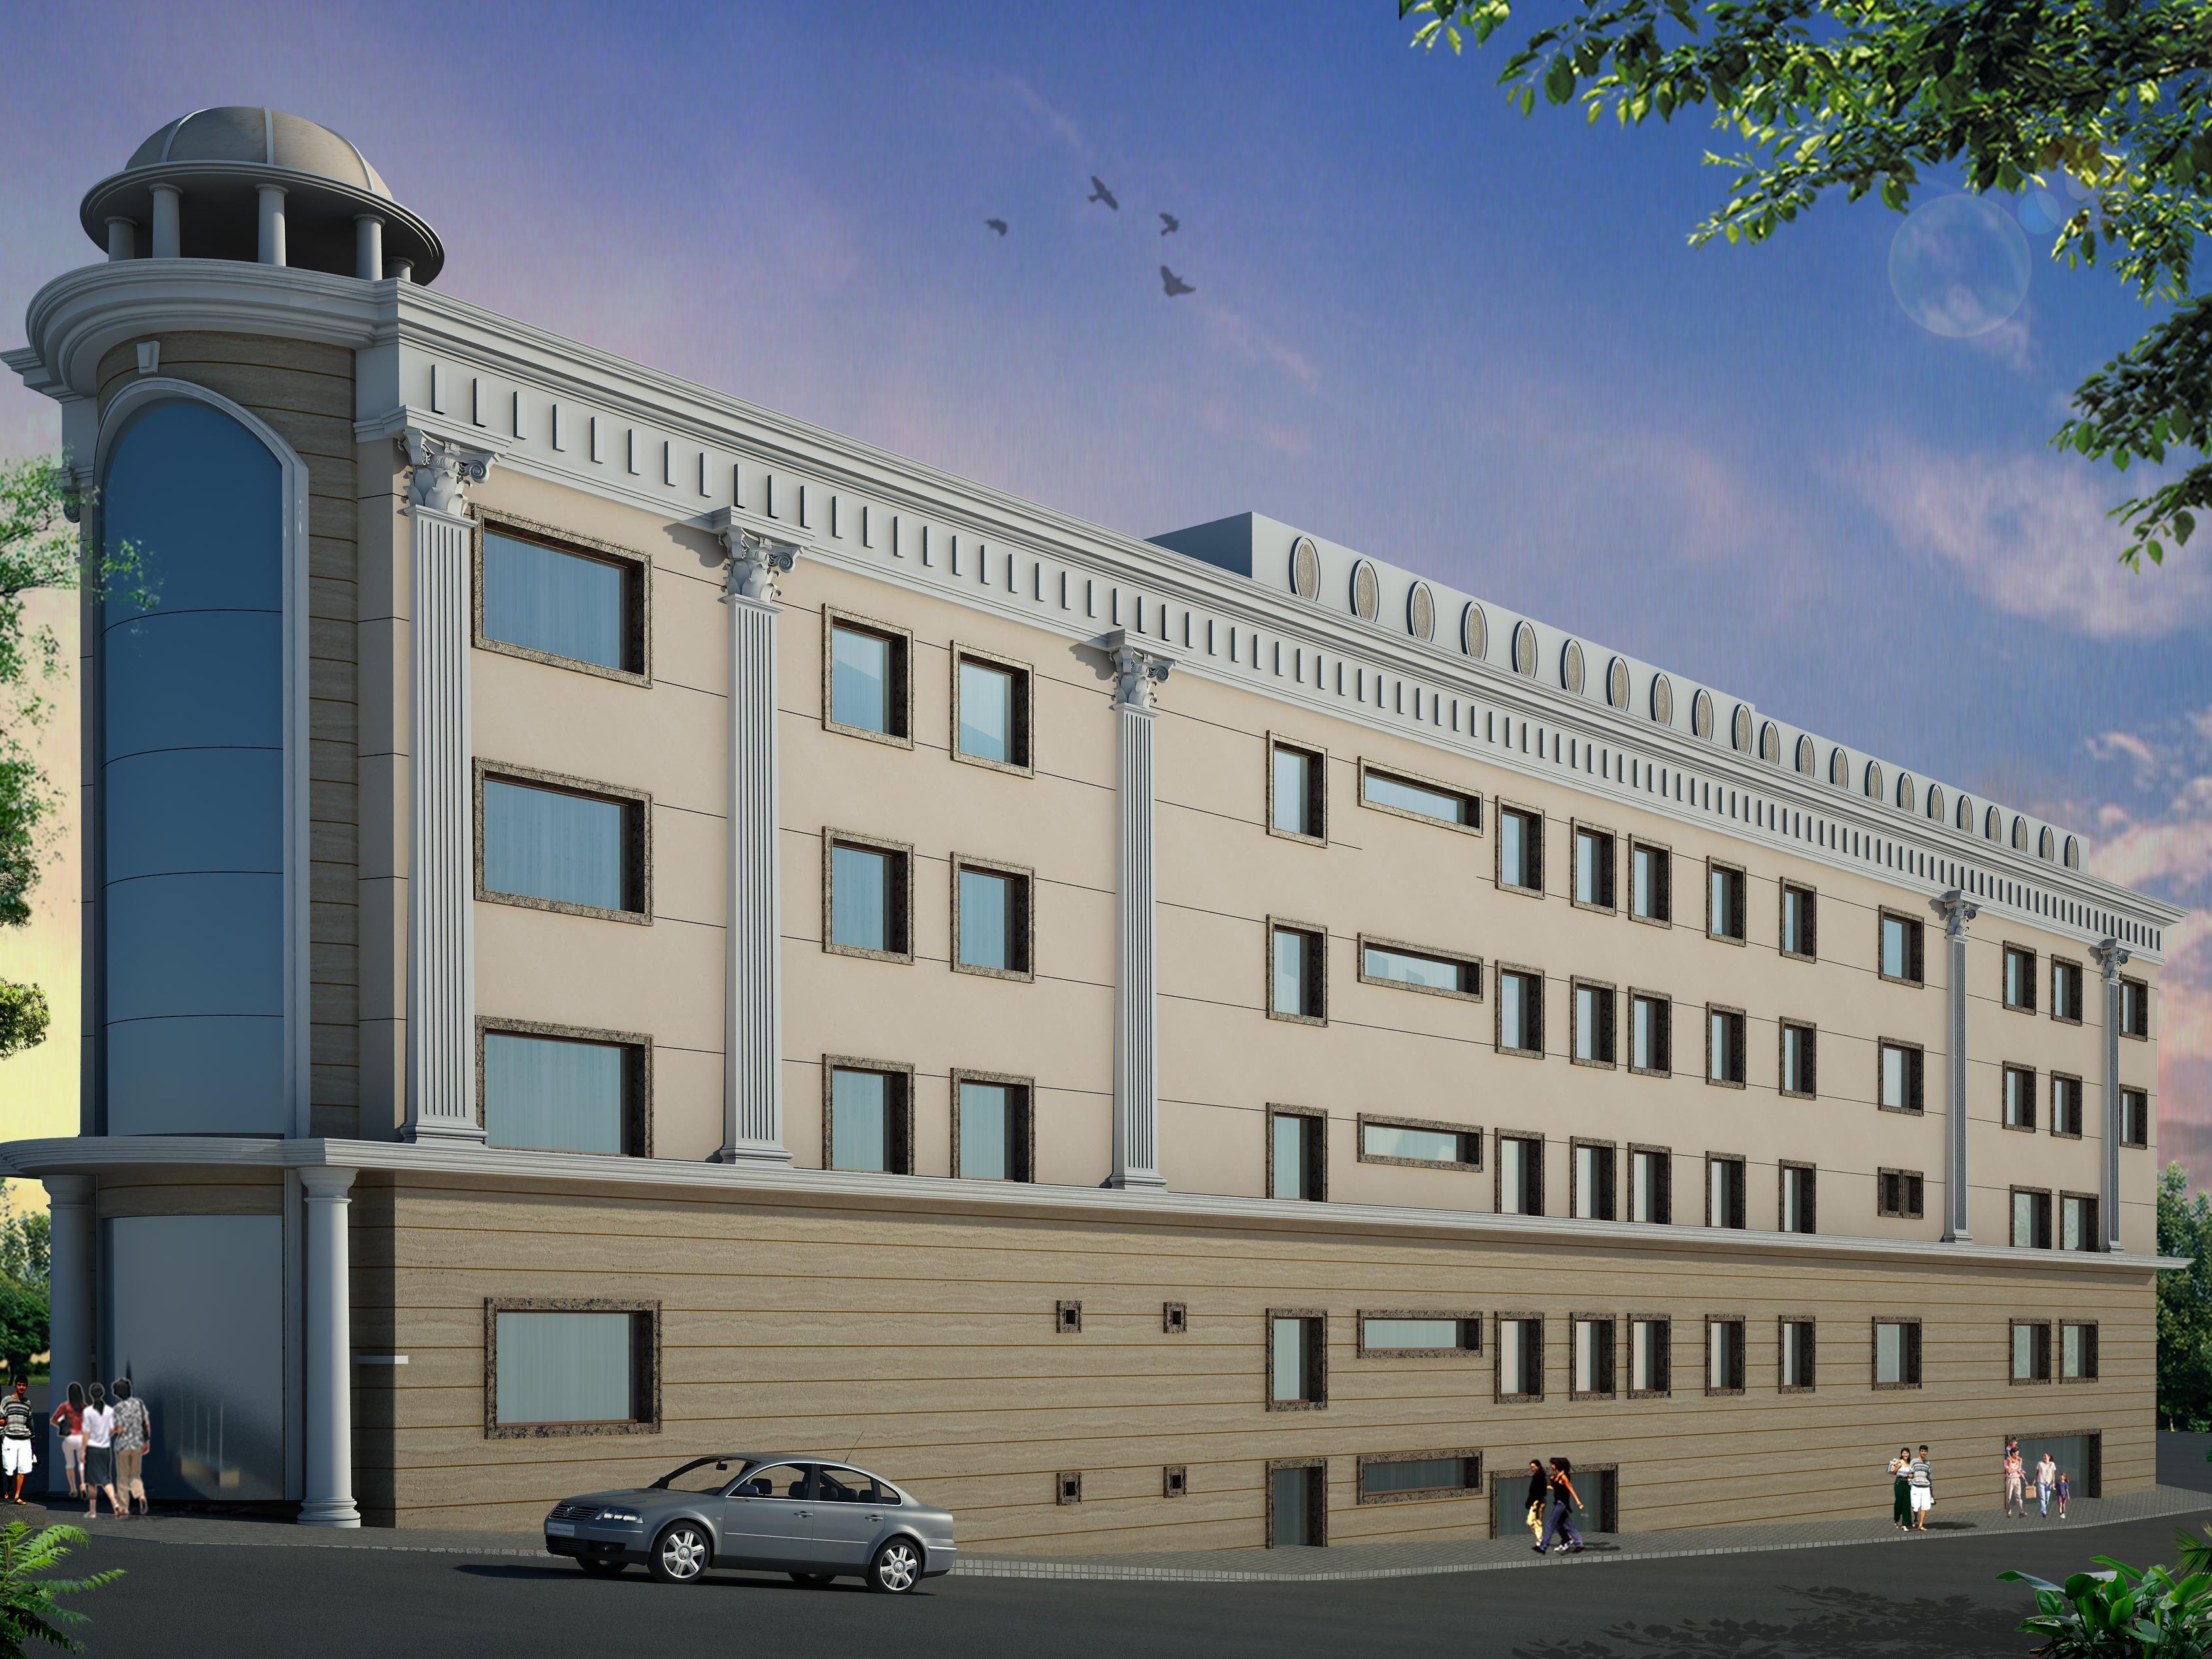 Hotel Istana Permata Ngagel Gwalior Clarks Inn Suite Gwalior India Asia Stop At Clarks Inn